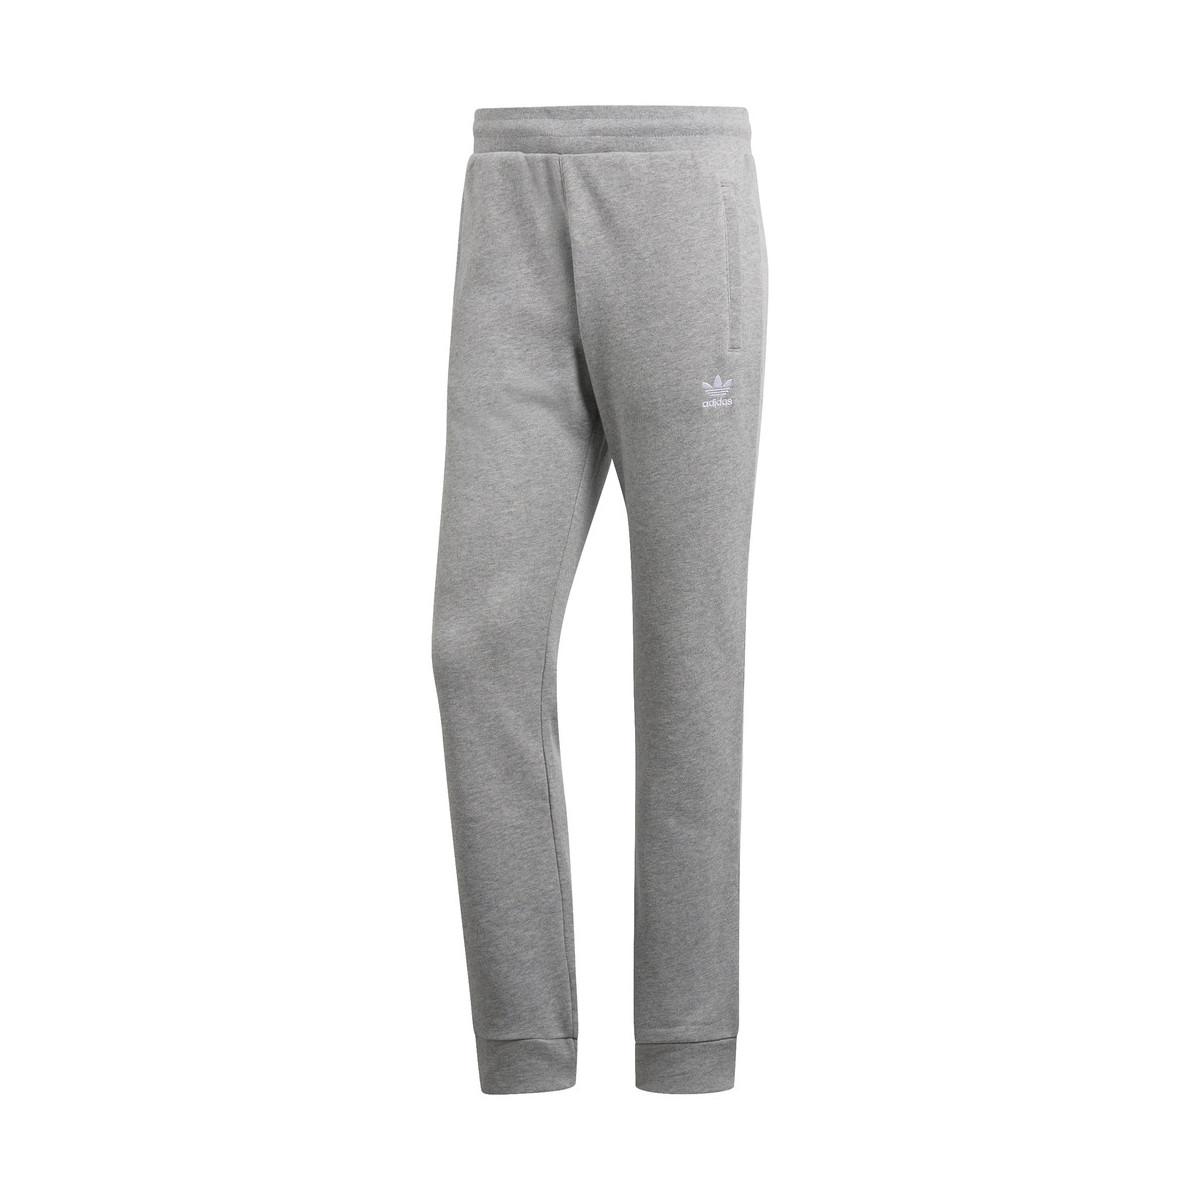 Pantalon de survêtement adidas Originals TREFOIL ESSENTIALS DownTownStock.Com